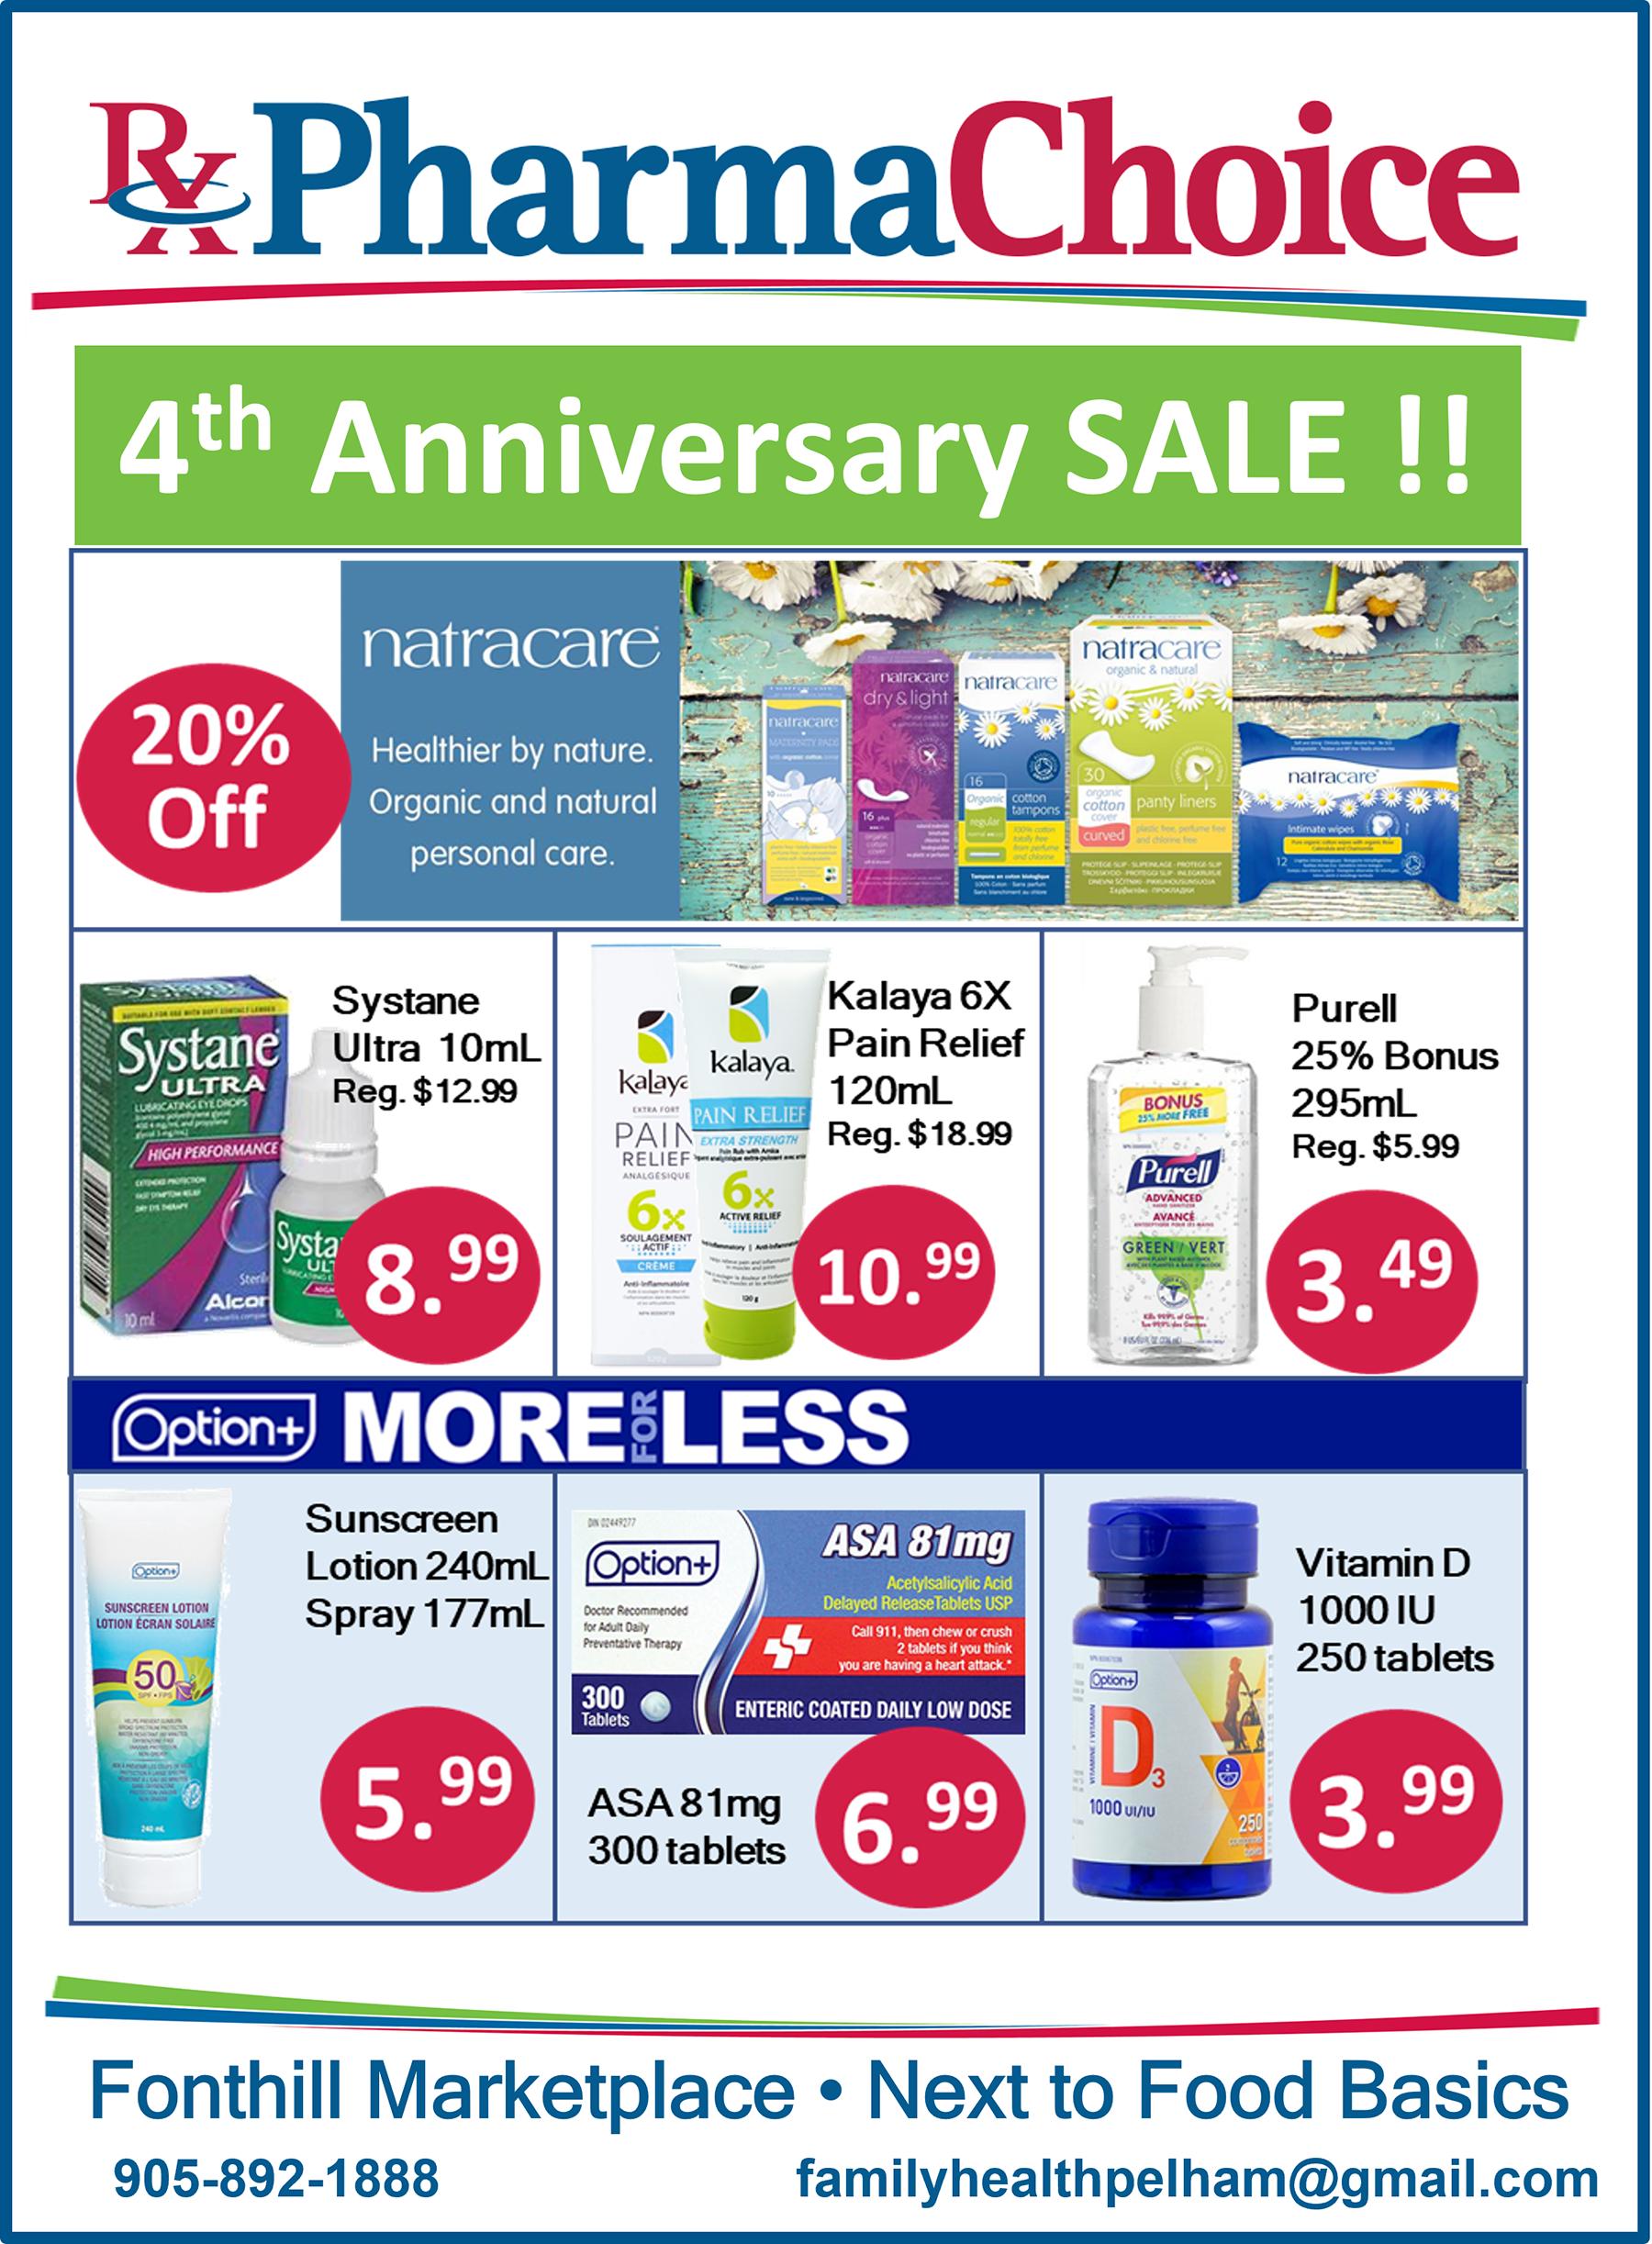 4th Anniversary Celebration Savings